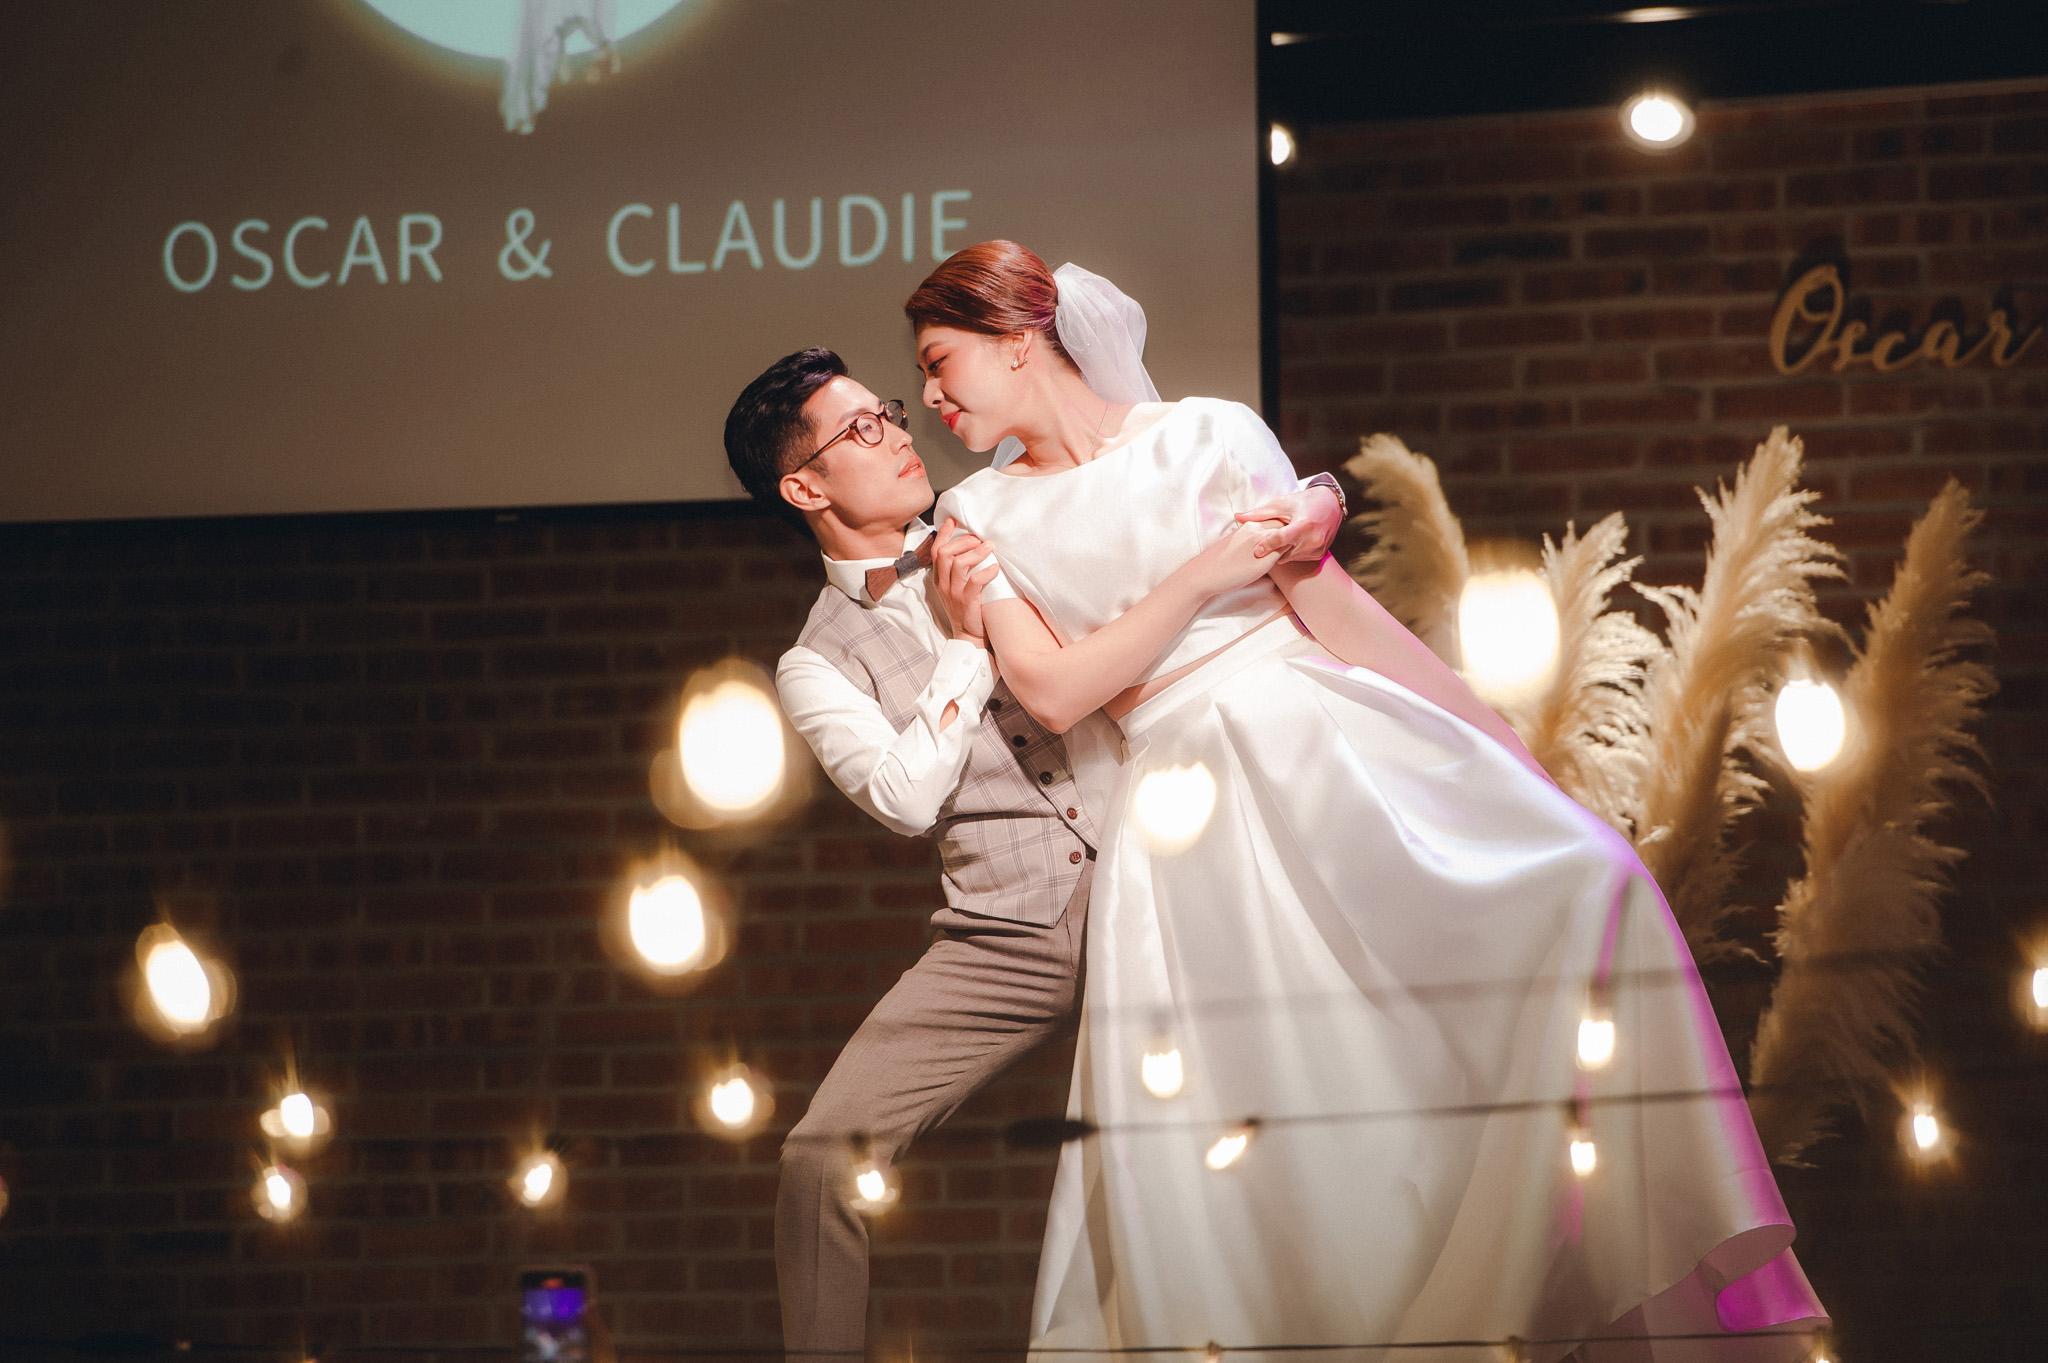 EW 台北婚攝 居米 濟南教會 Brick Yard 33 美軍俱樂部 婚禮 婚宴-74